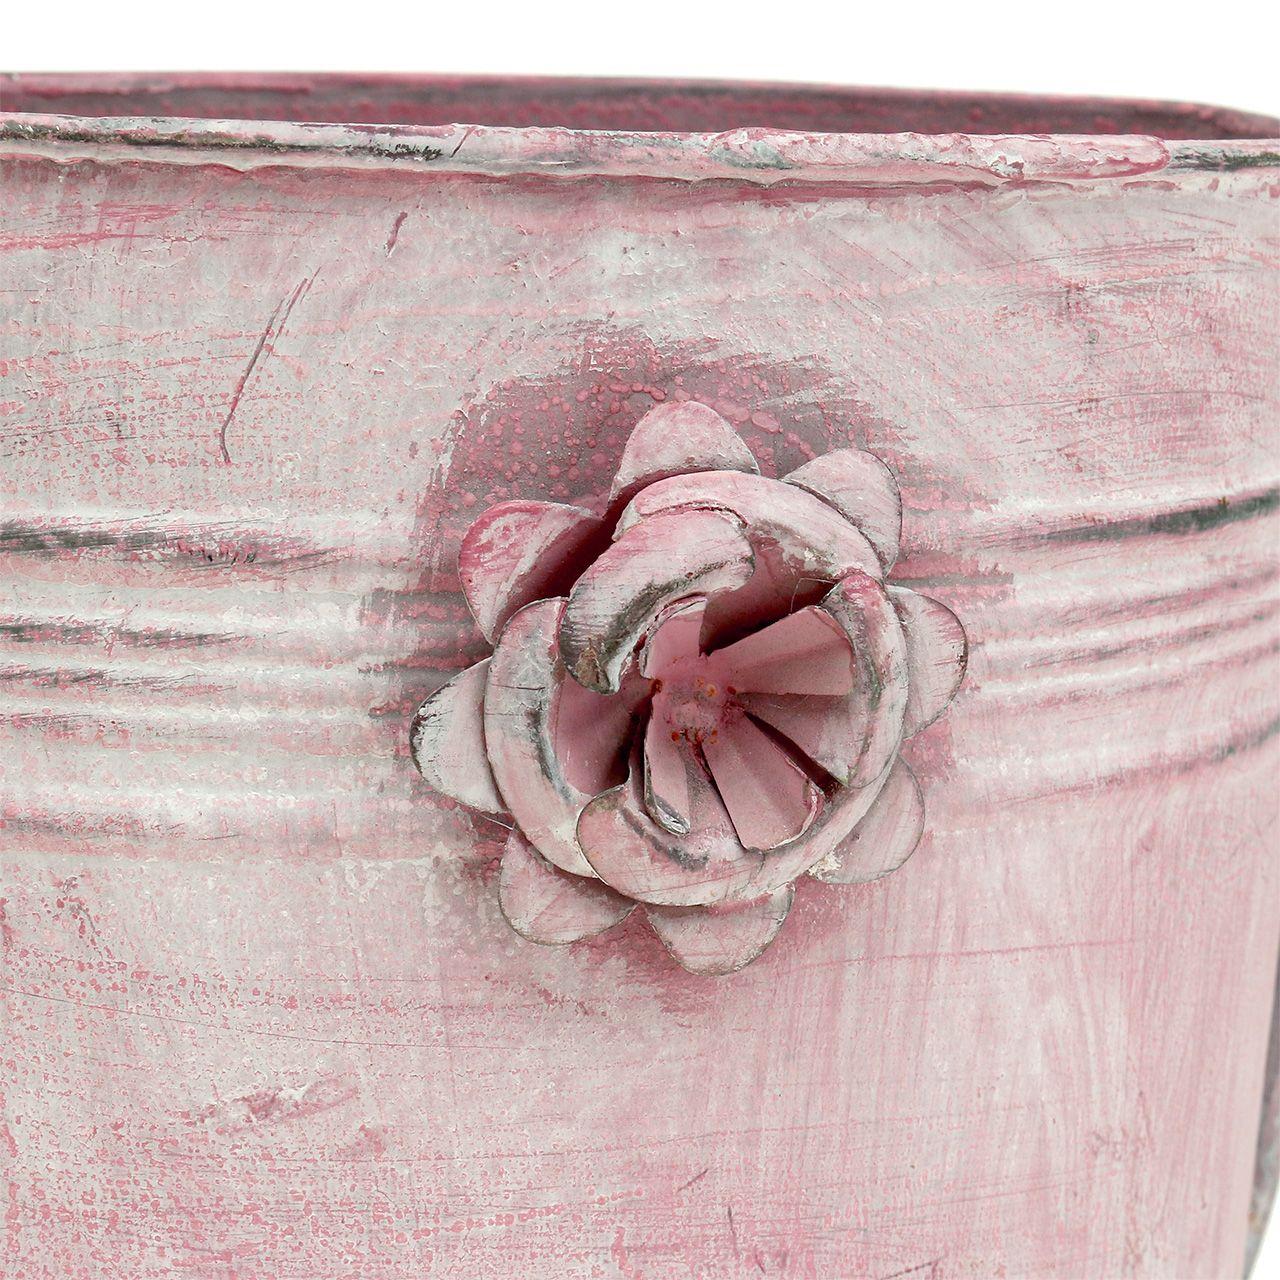 deko gie kanne aus metall rosa l33cm b12cm h29cm kaufen in. Black Bedroom Furniture Sets. Home Design Ideas